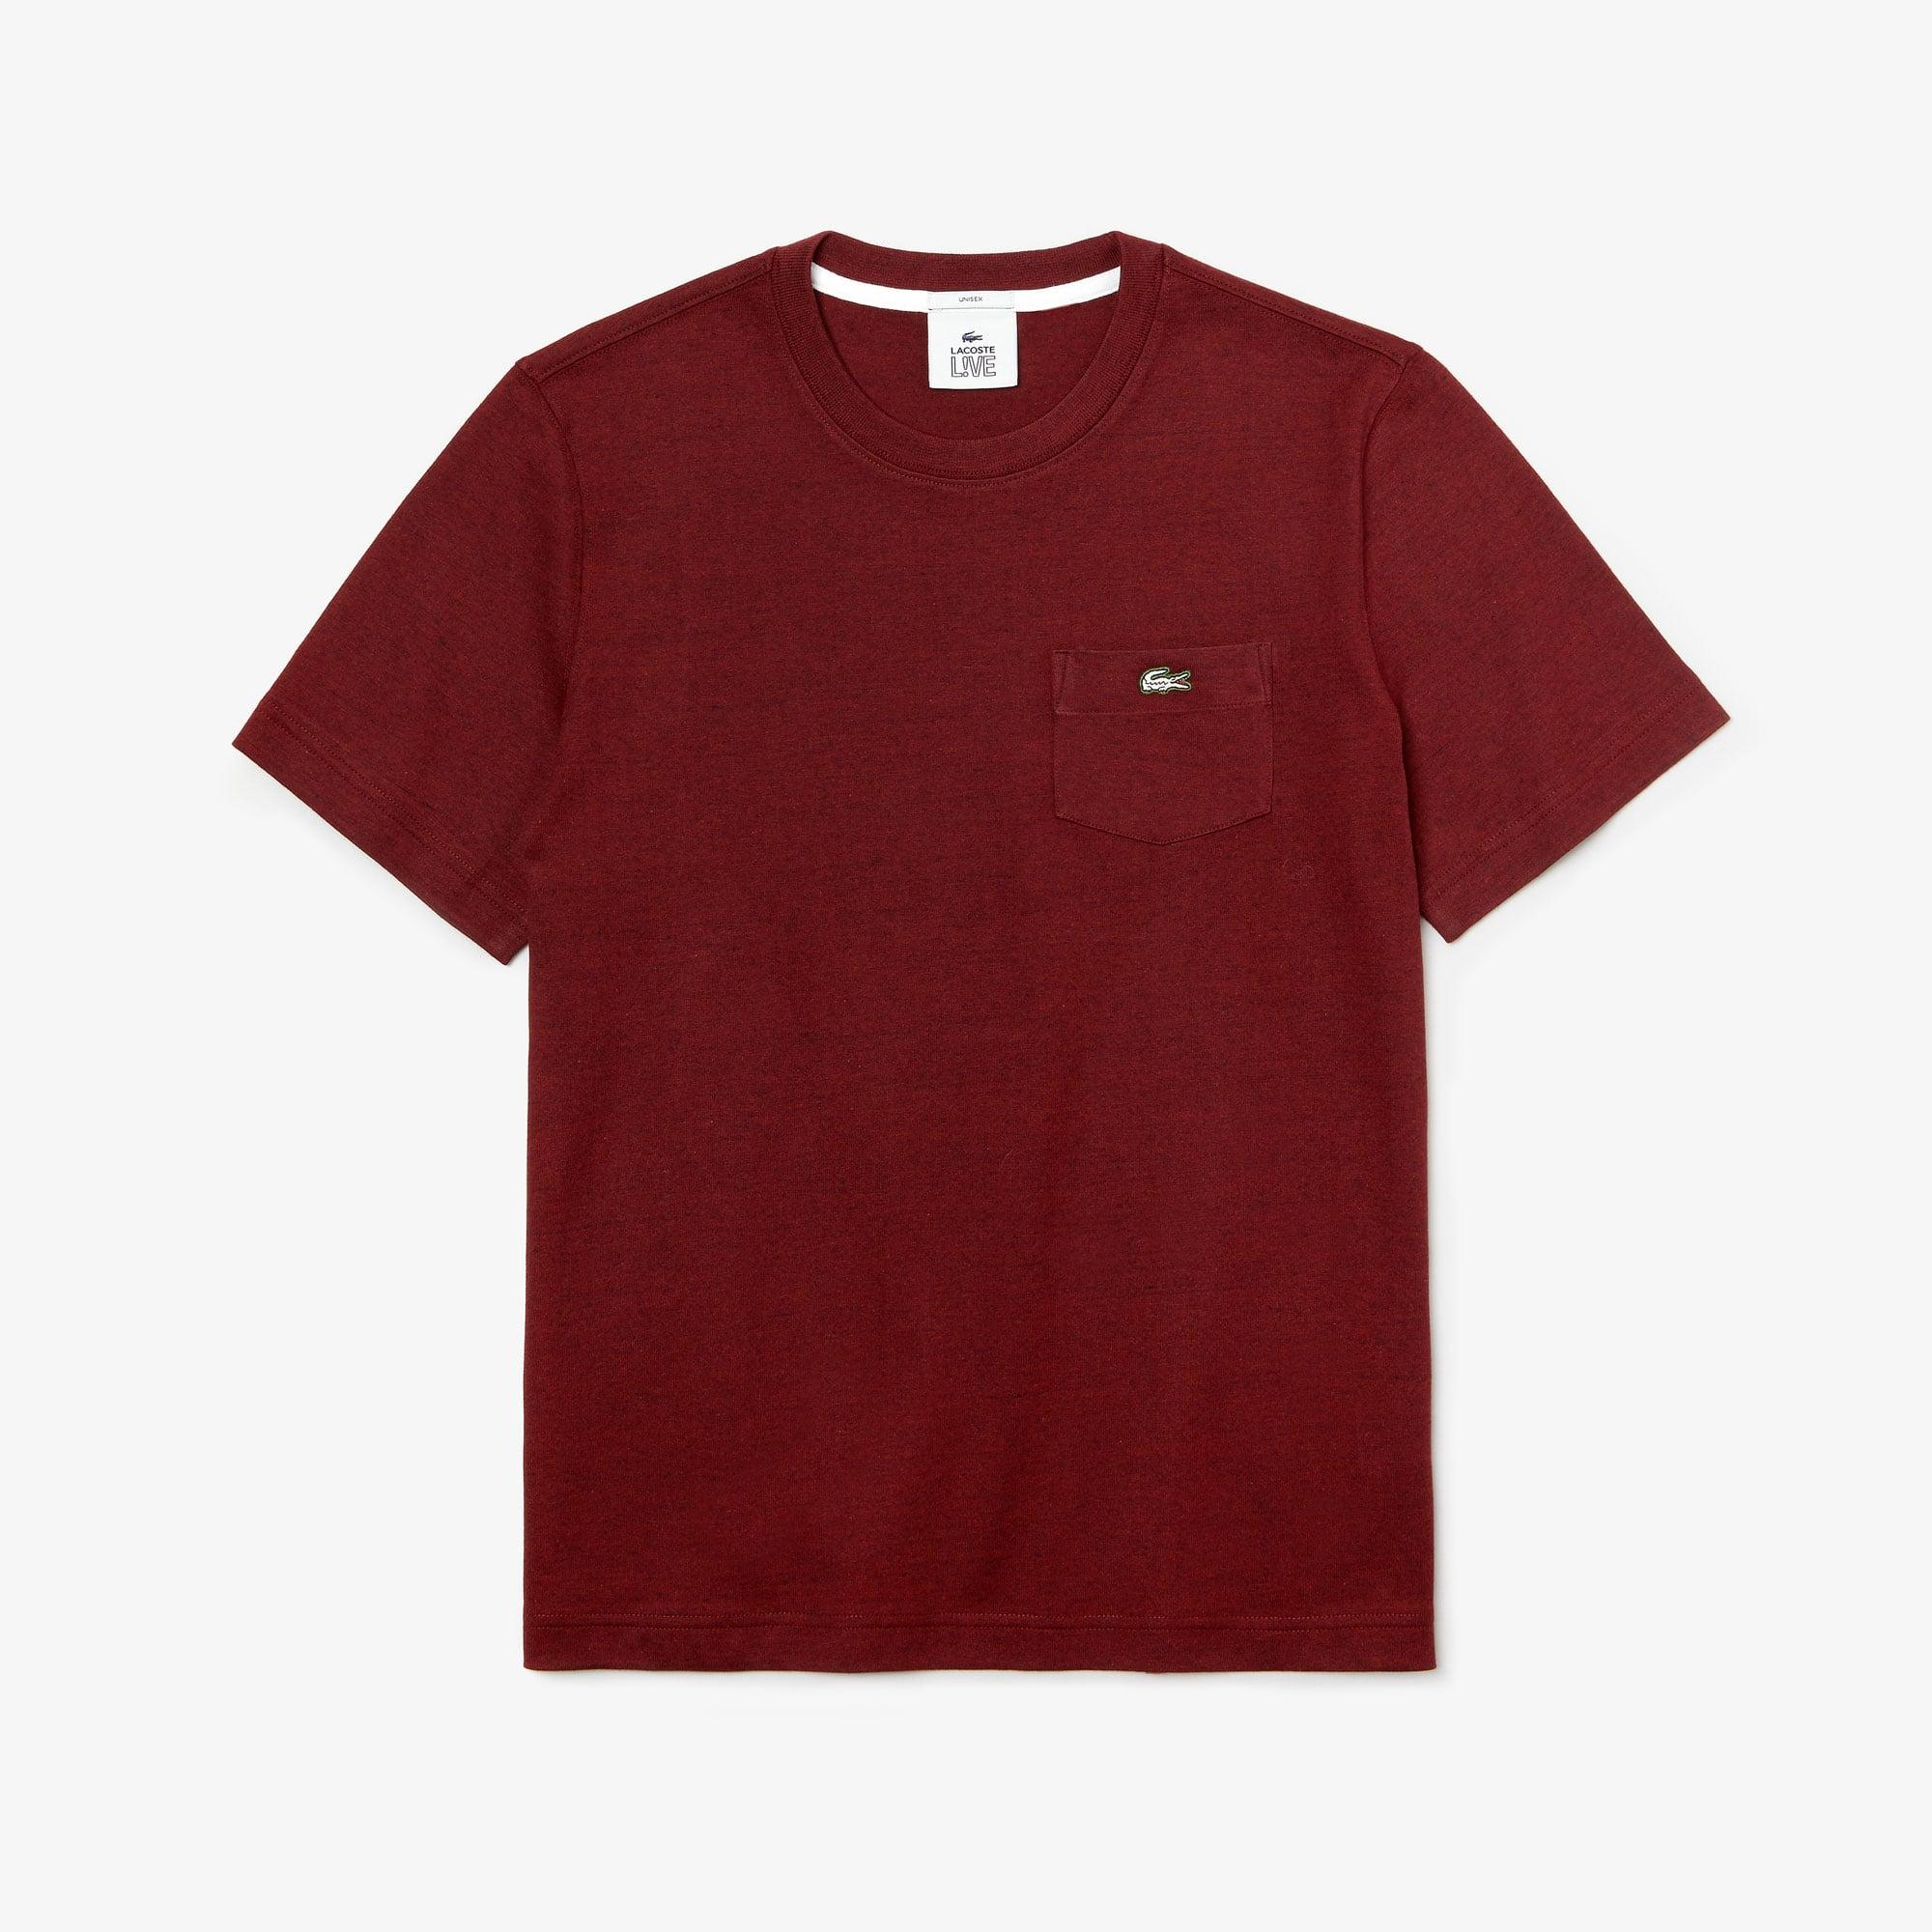 Homme Lacoste T ShirtsVêtements T Live ShirtsVêtements IY7fvb6gy